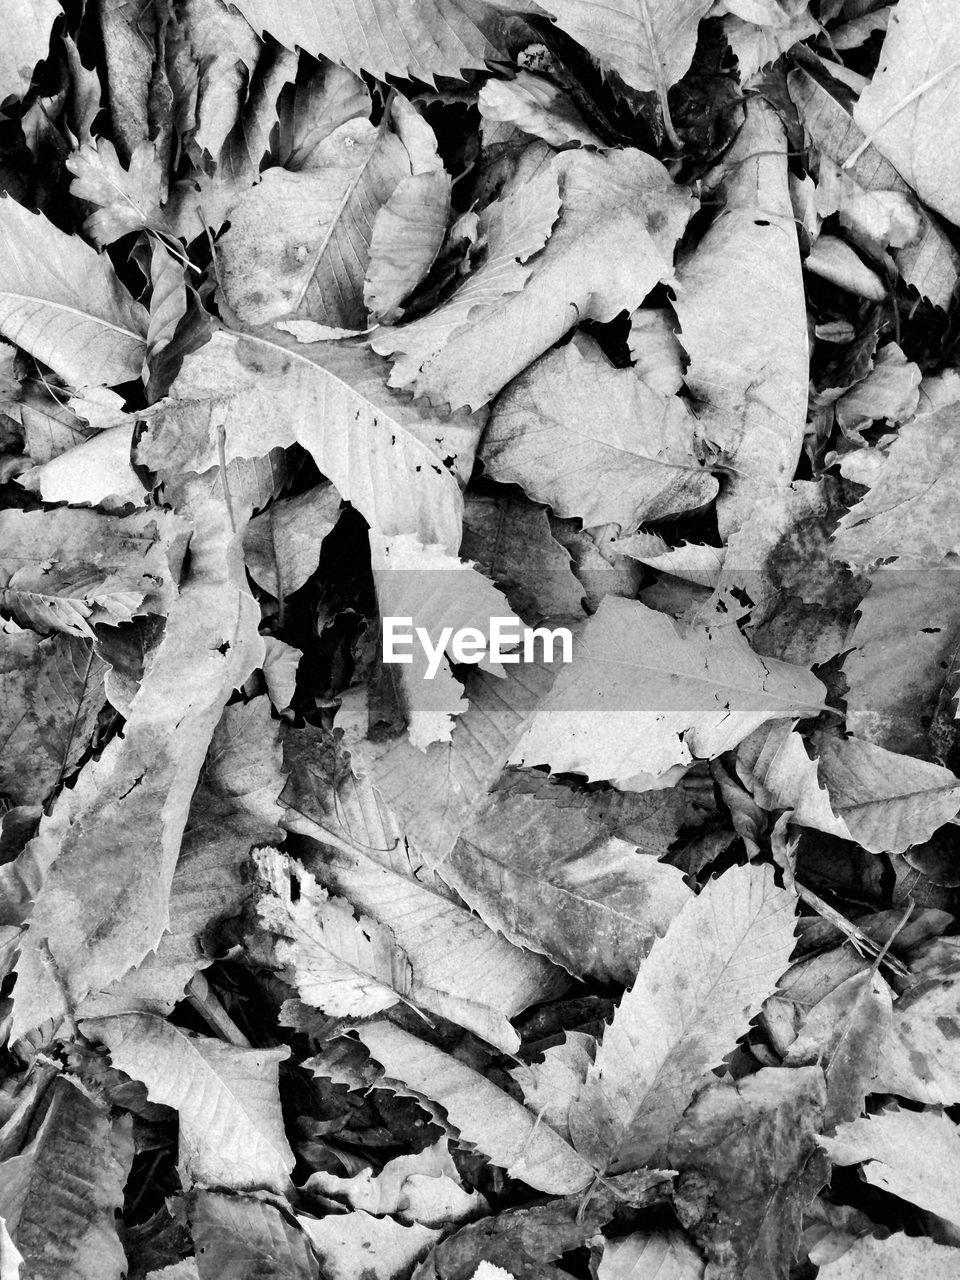 leaf, autumn, abundance, no people, backgrounds, day, full frame, nature, change, outdoors, fragility, close-up